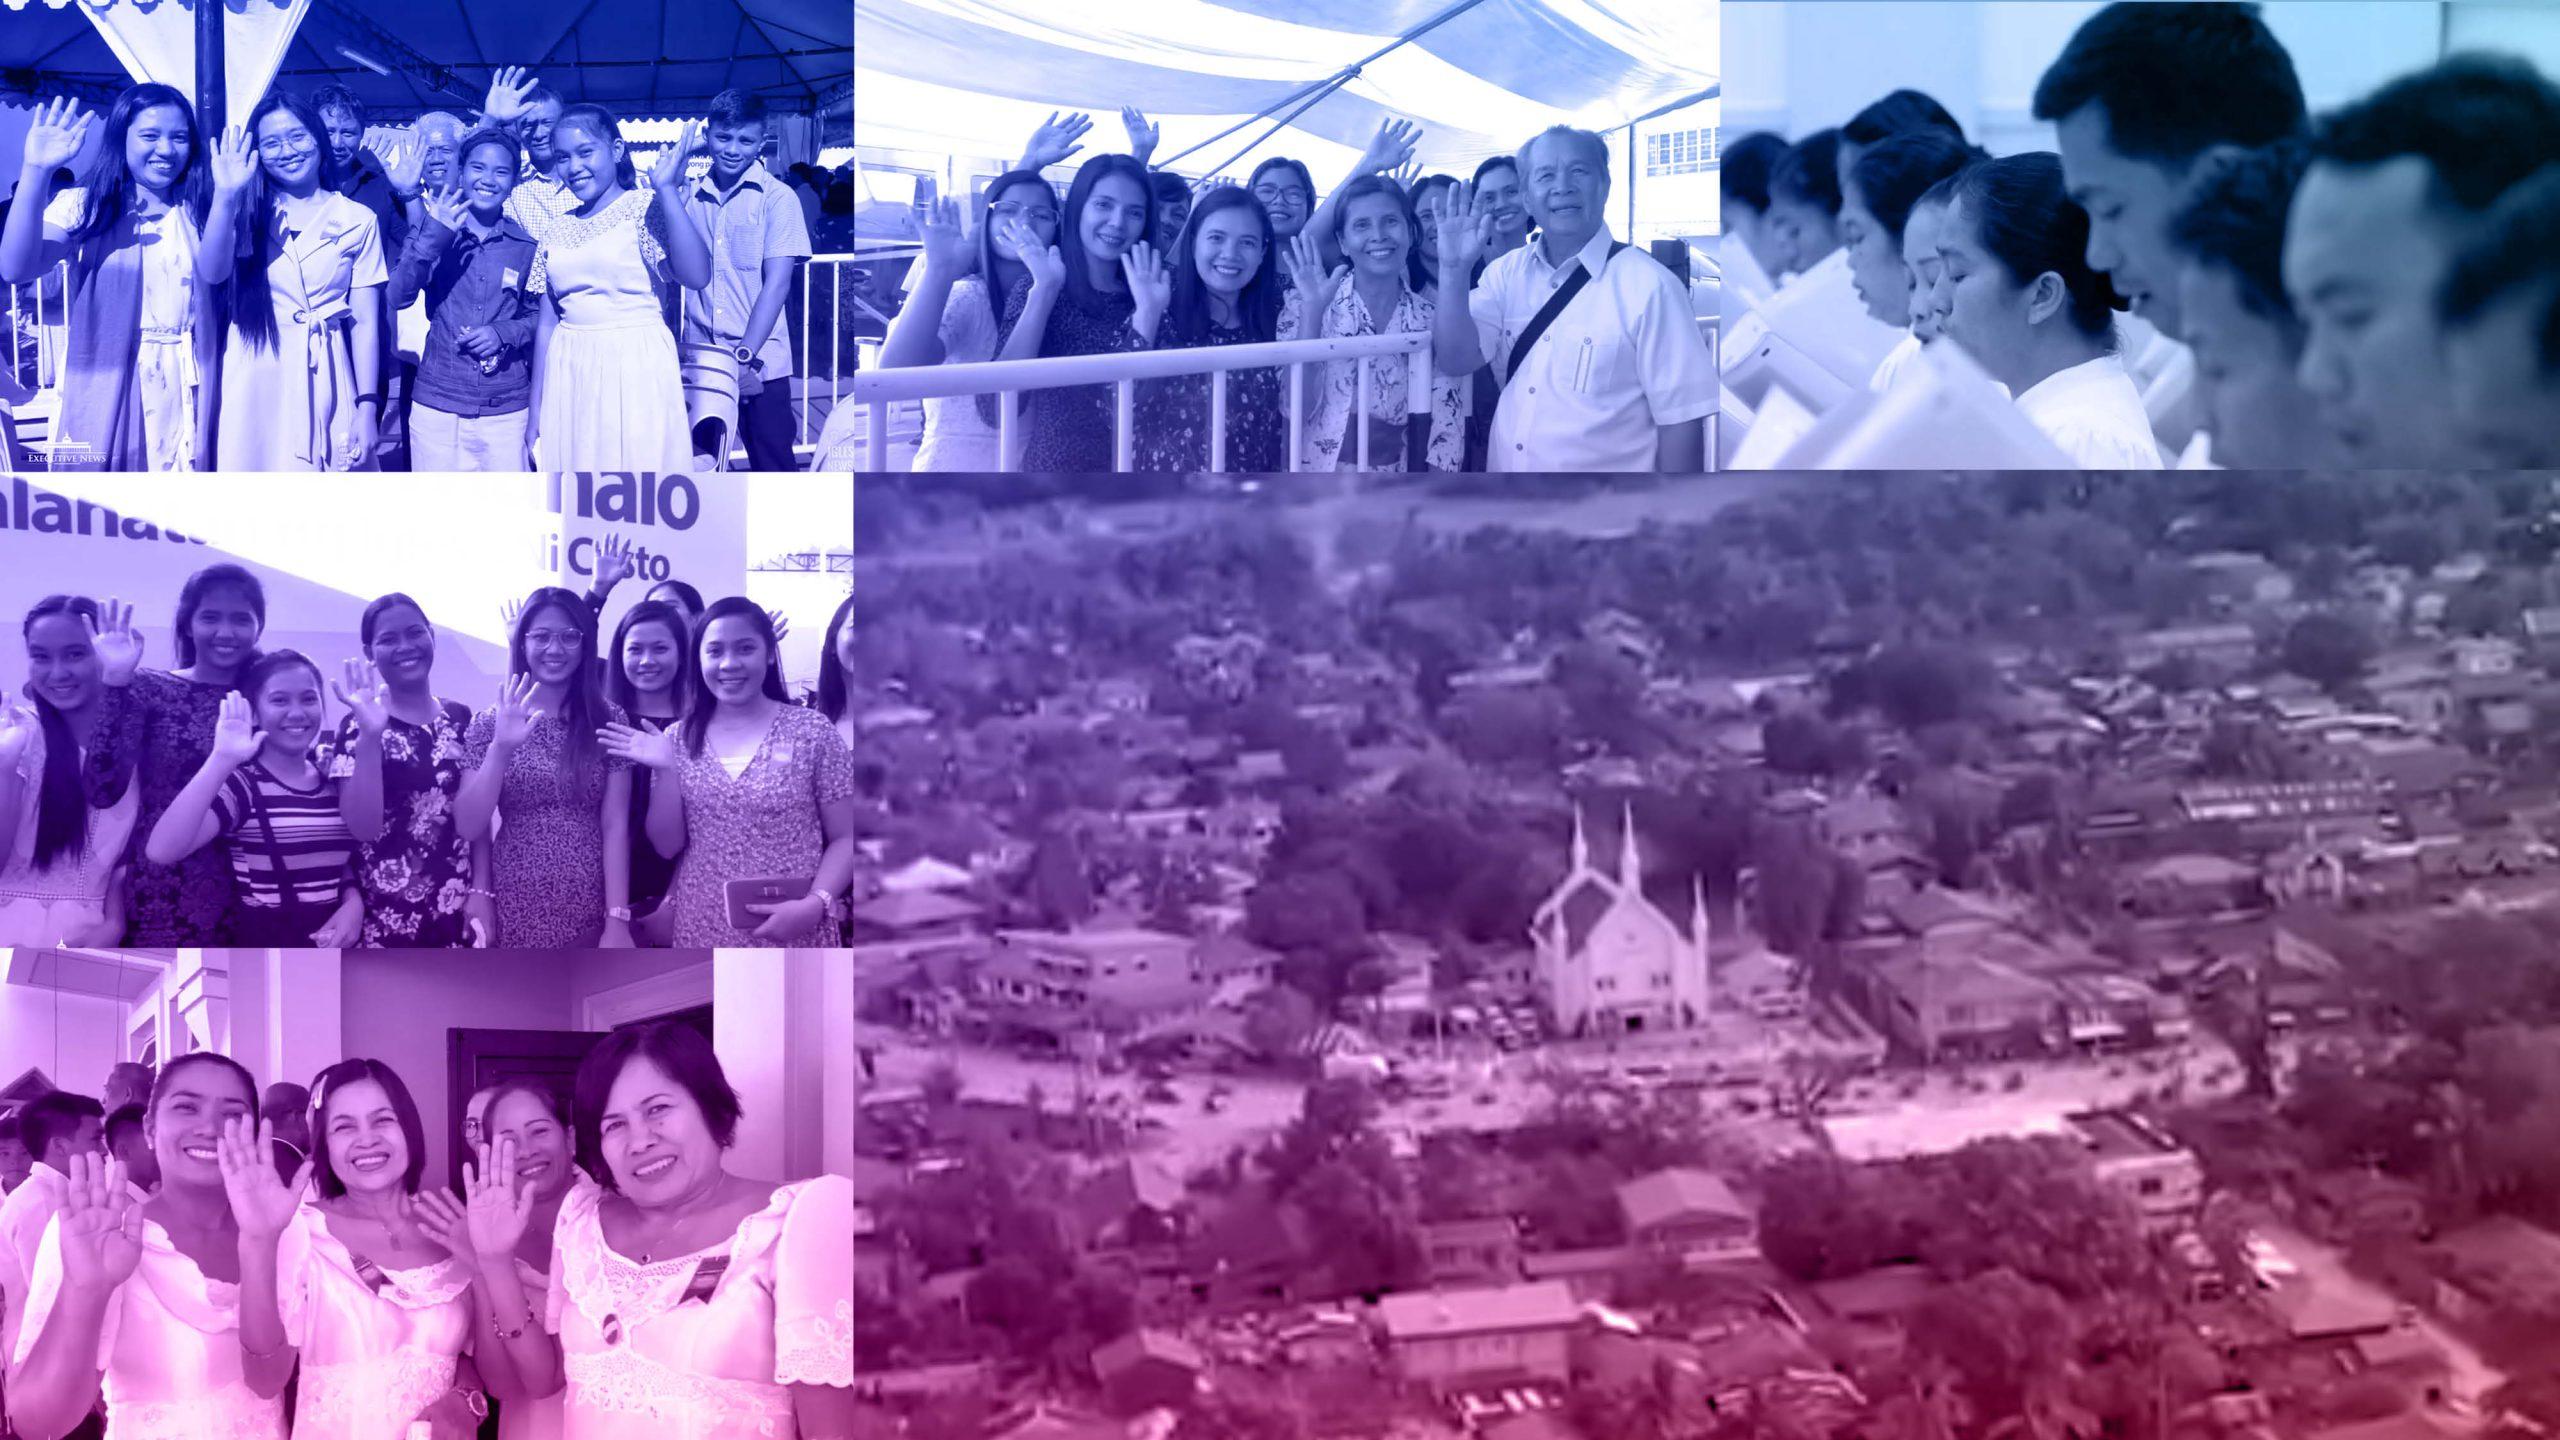 Executive Minister visits brethren in Mamburao, Occidental Mindoro